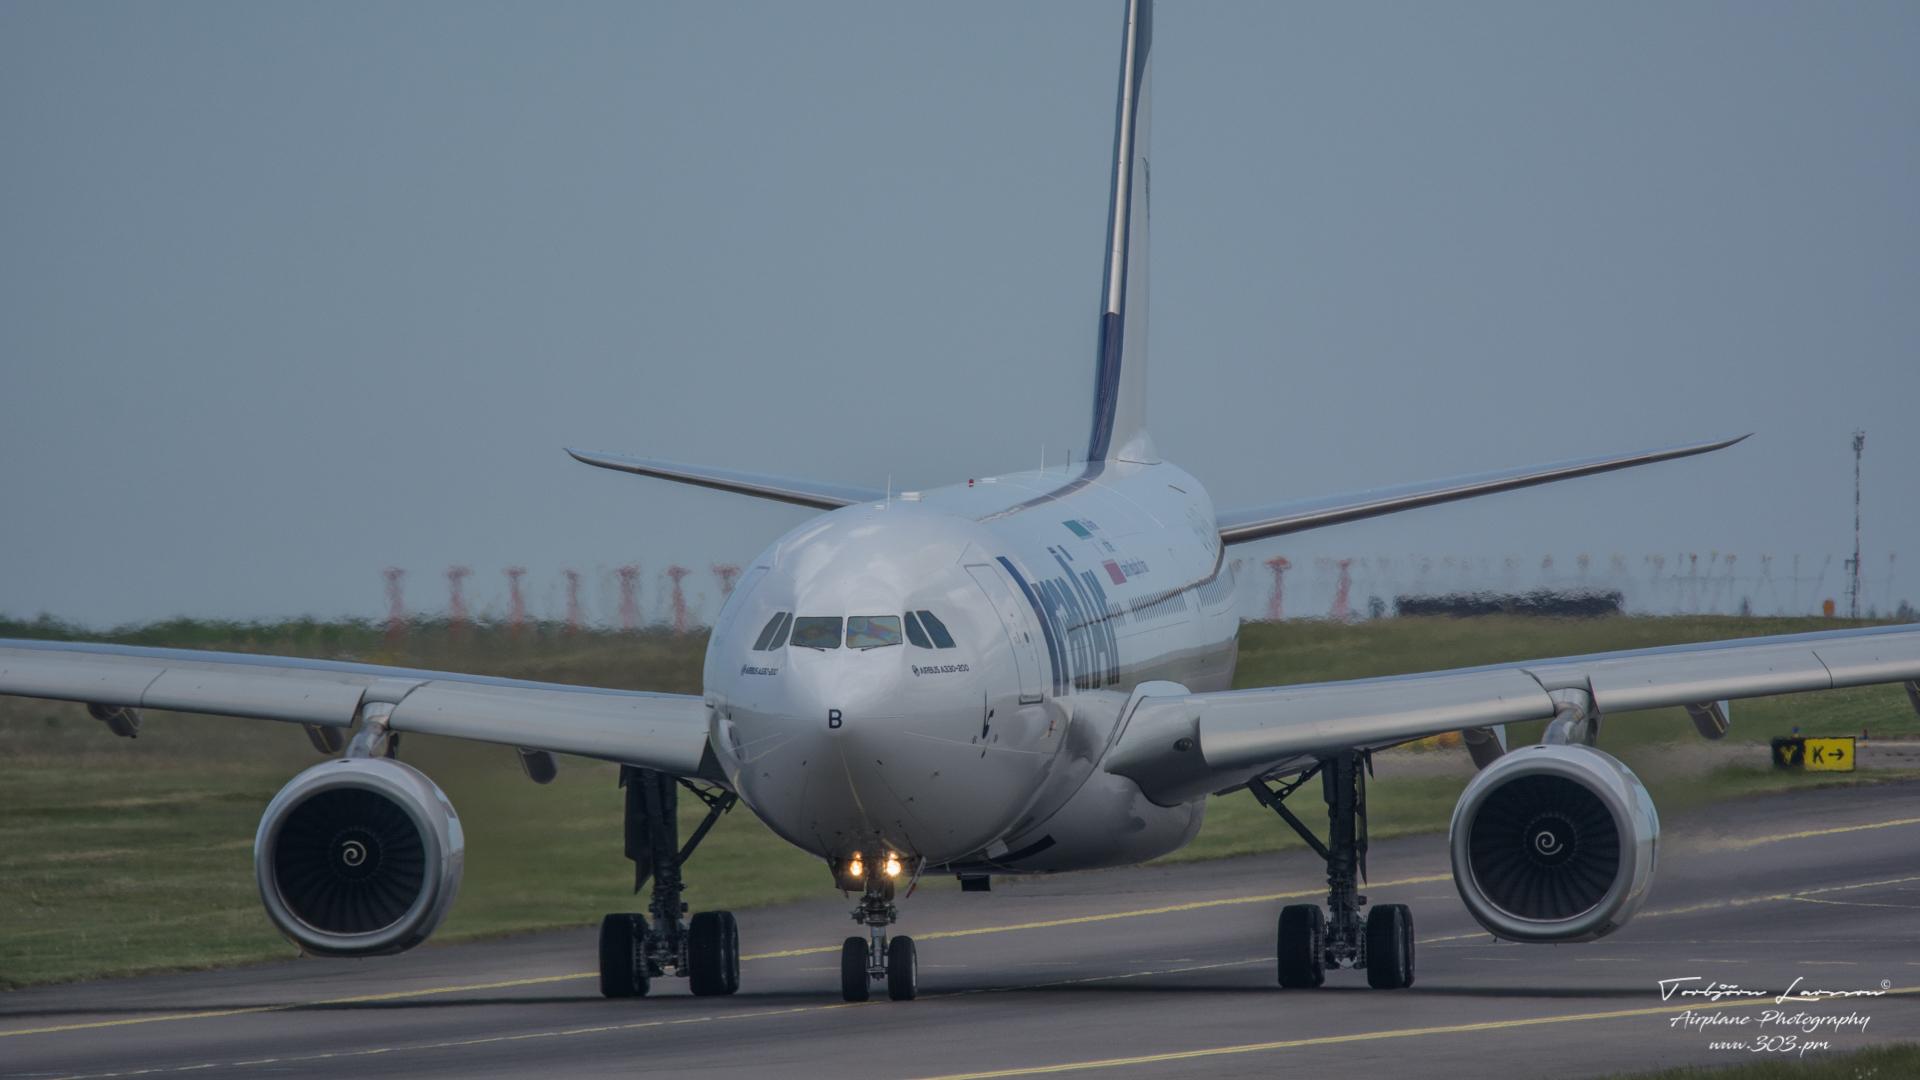 TBE_8558-Airbus A330-243 - Iran Air - (EP-IJB)